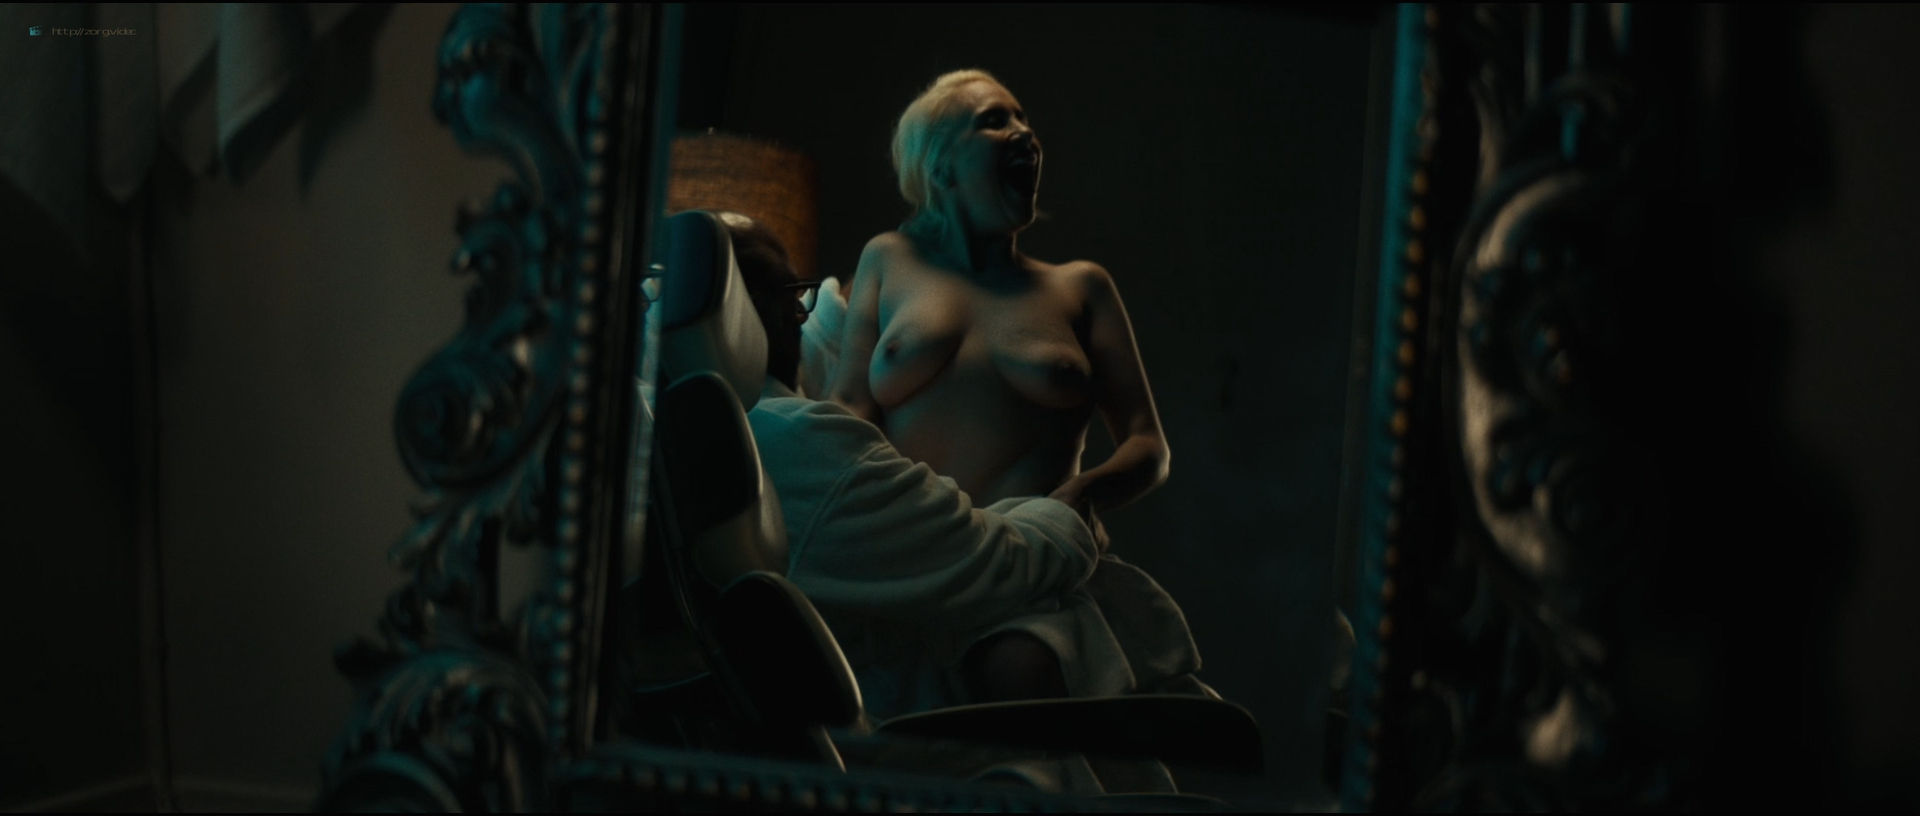 Emily Ratajkowski hot sideboob - Lying and Stealing (2019) 1080p WEB (15)